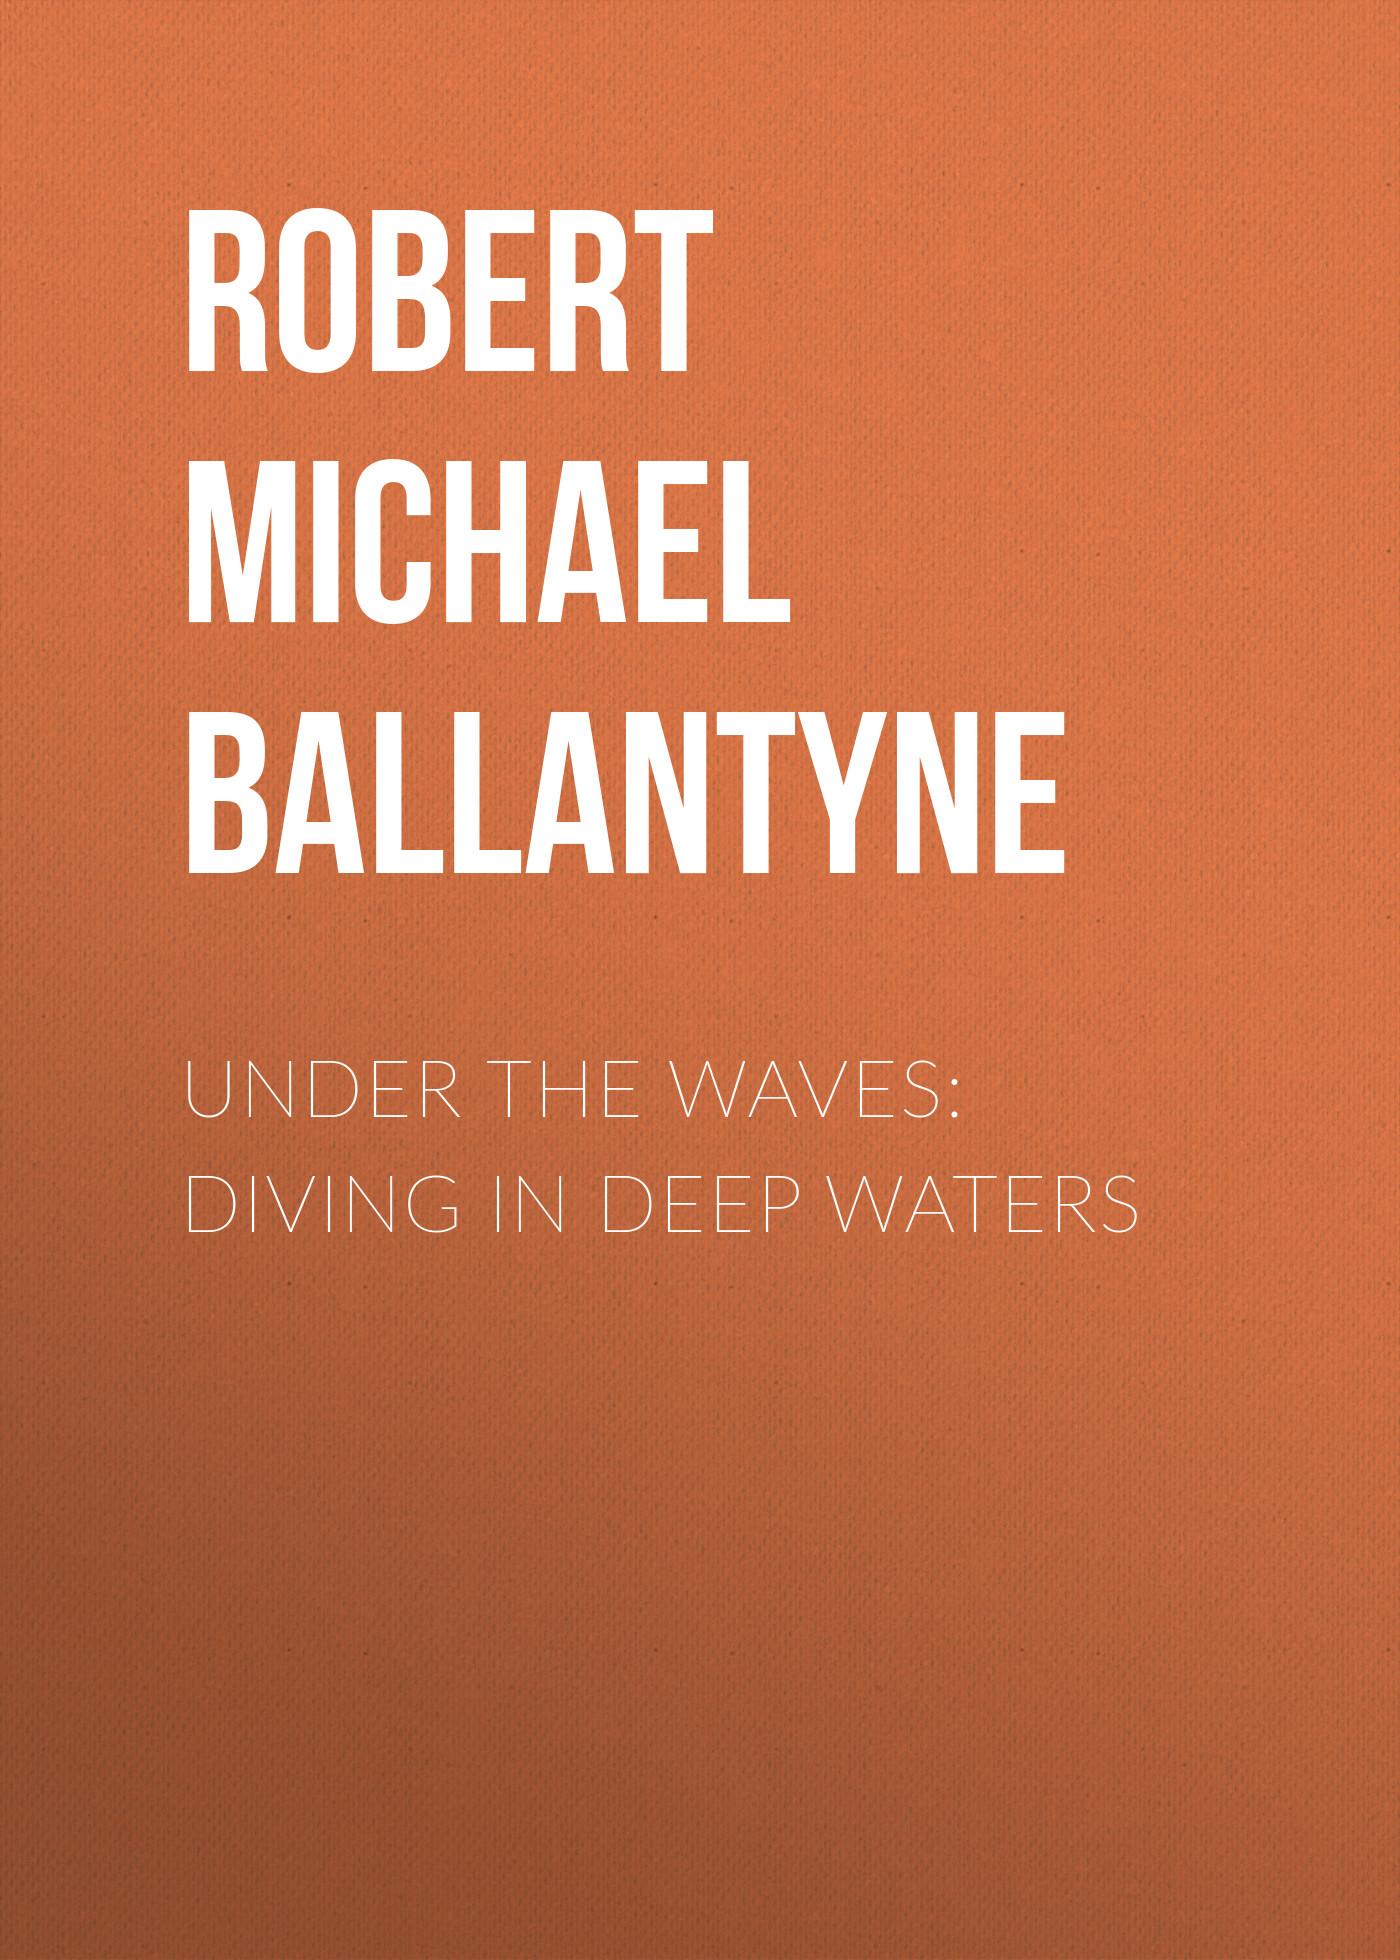 Robert Michael Ballantyne Under the Waves: Diving in Deep Waters tellichery goats under deep litter system